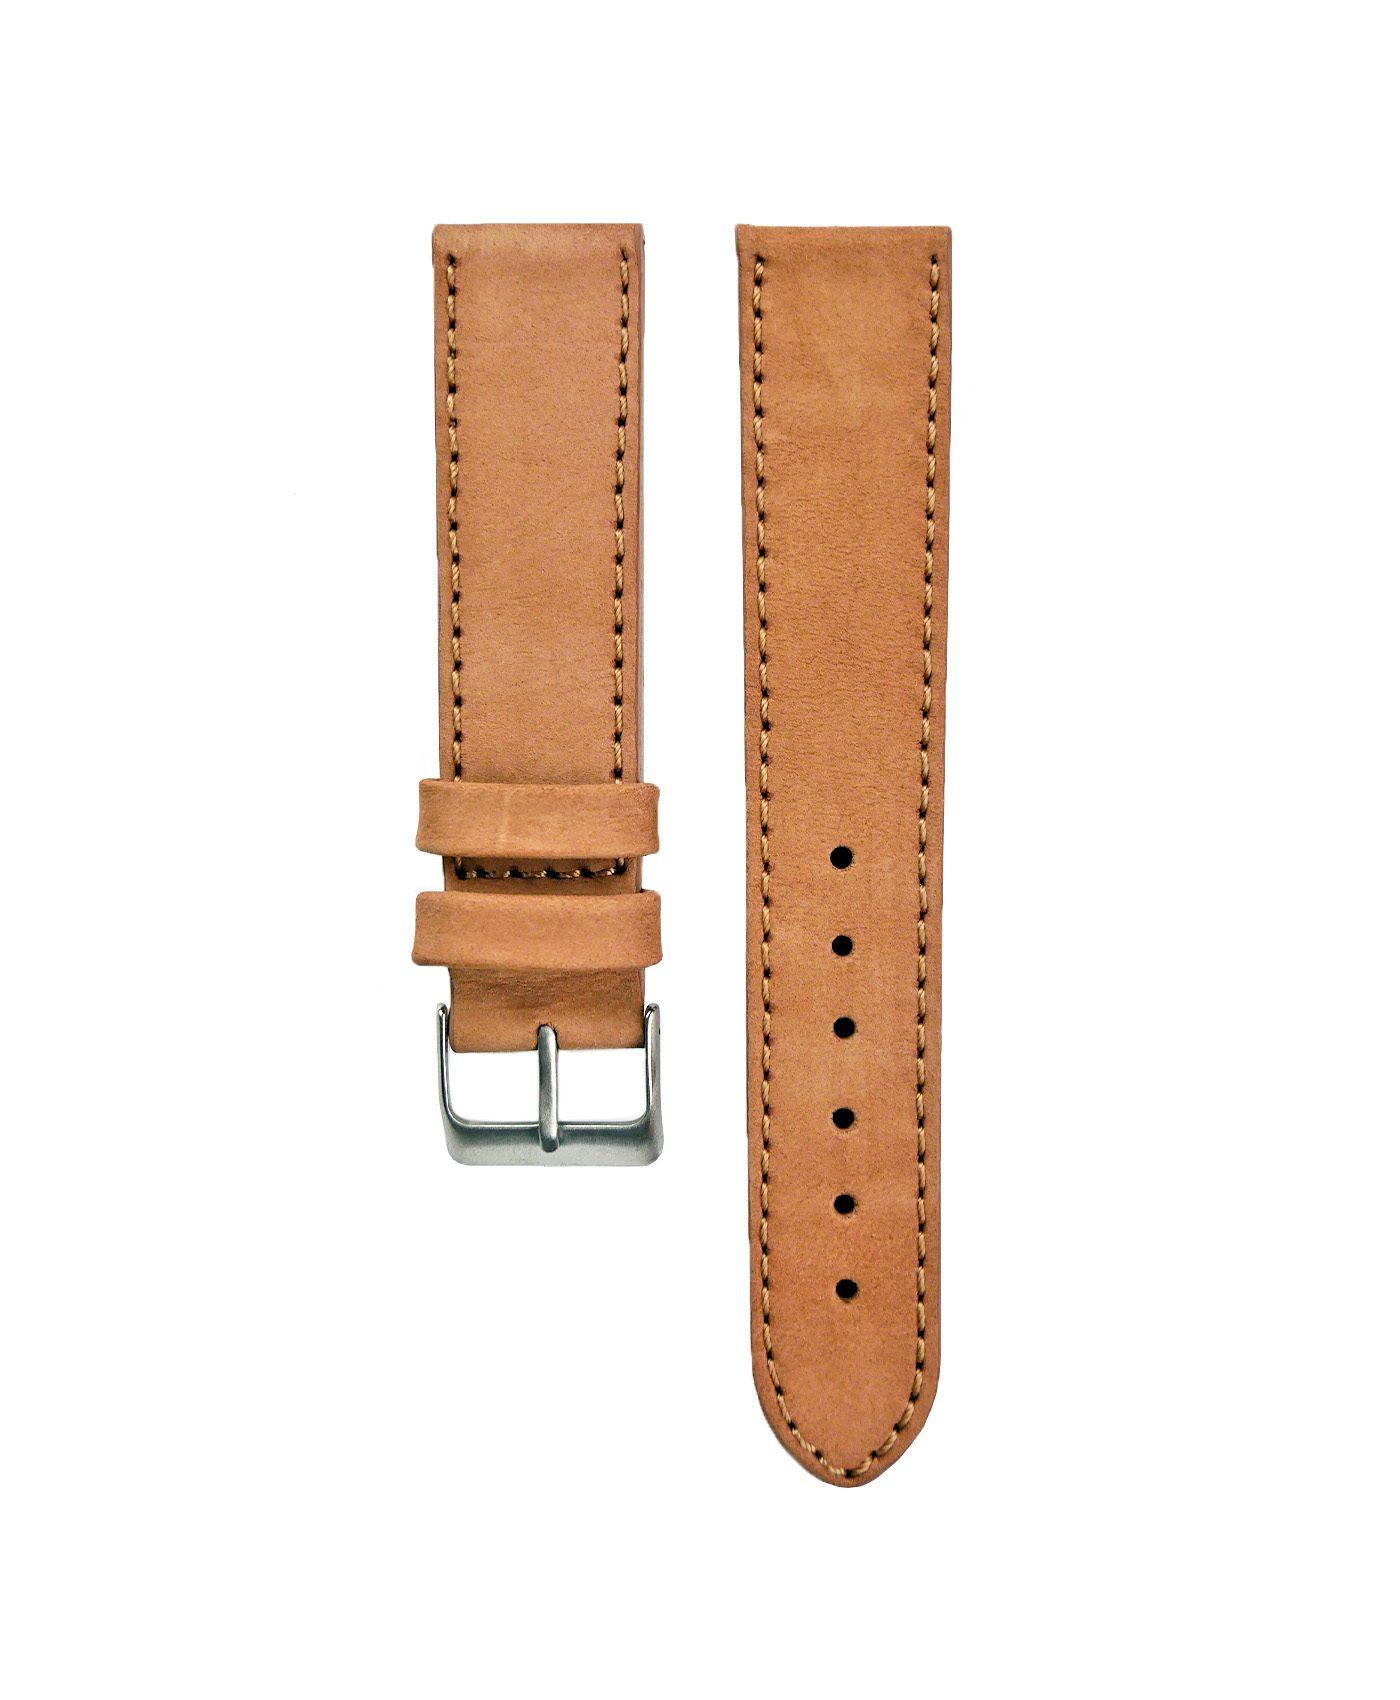 Pebro Premium Calfskin Watch Strap Terracotta Tanned No 190